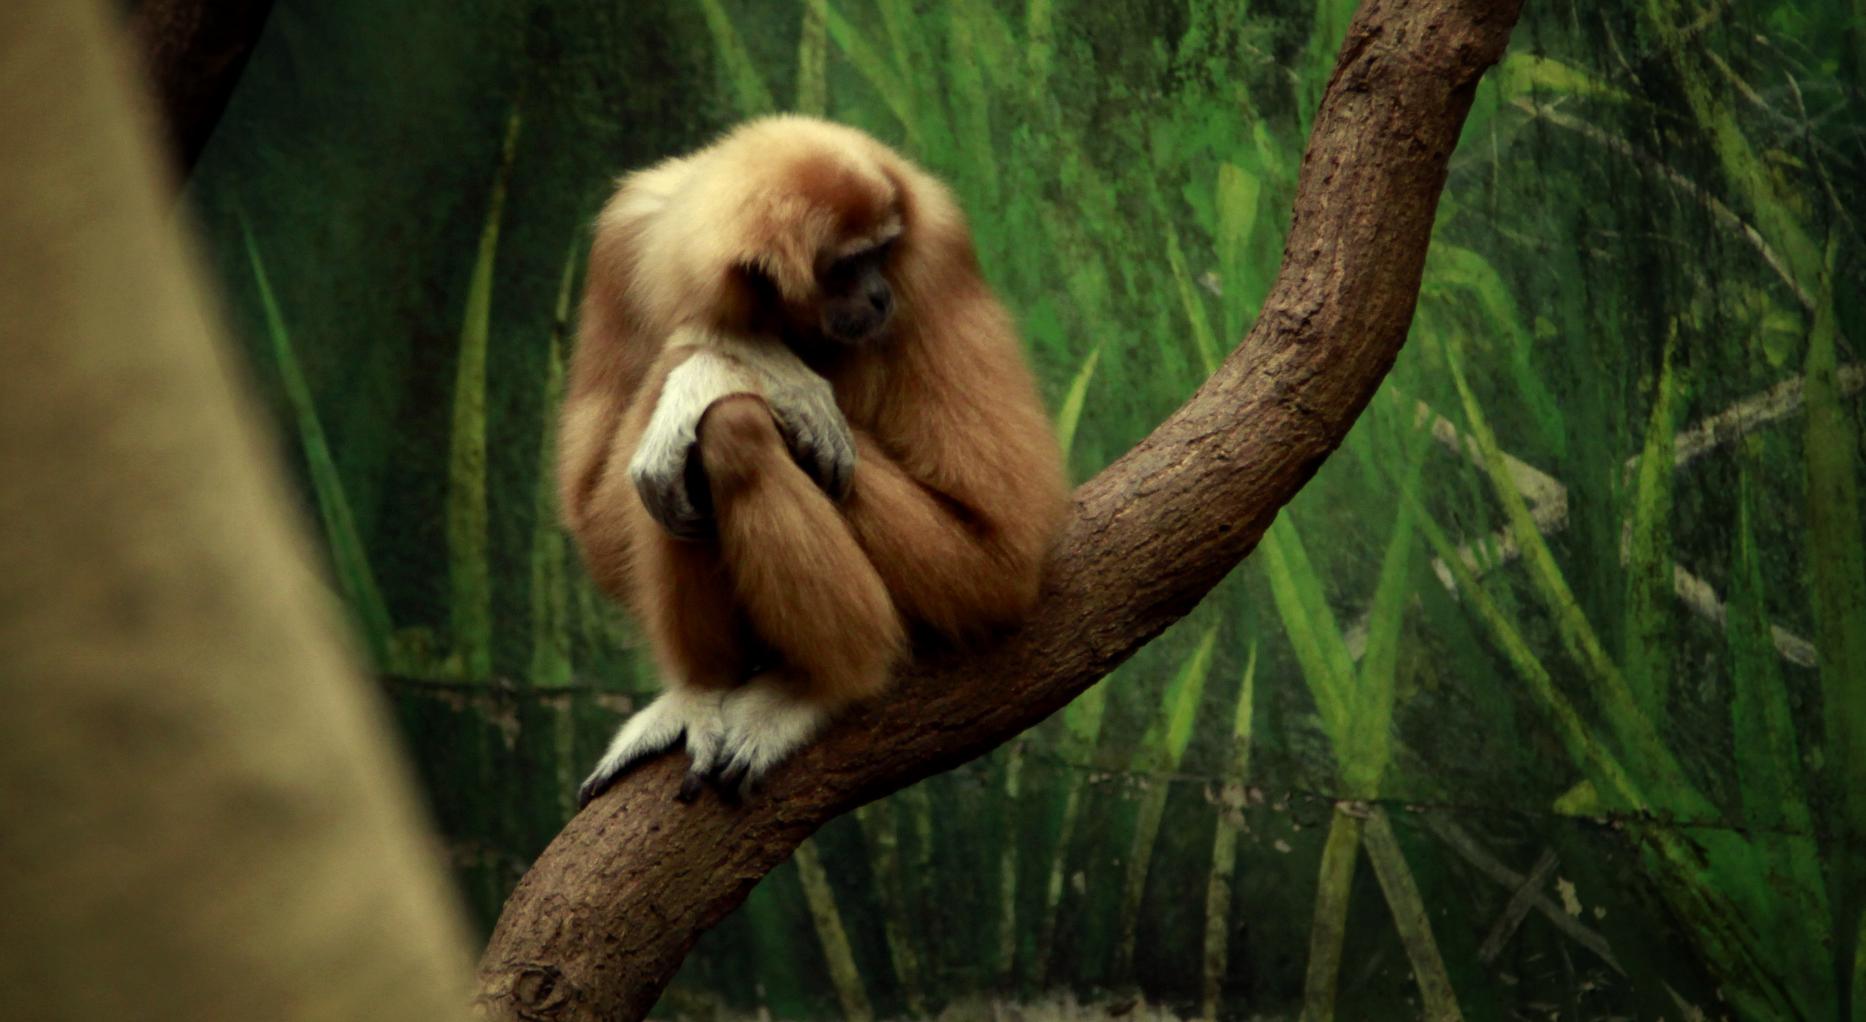 Pensive.